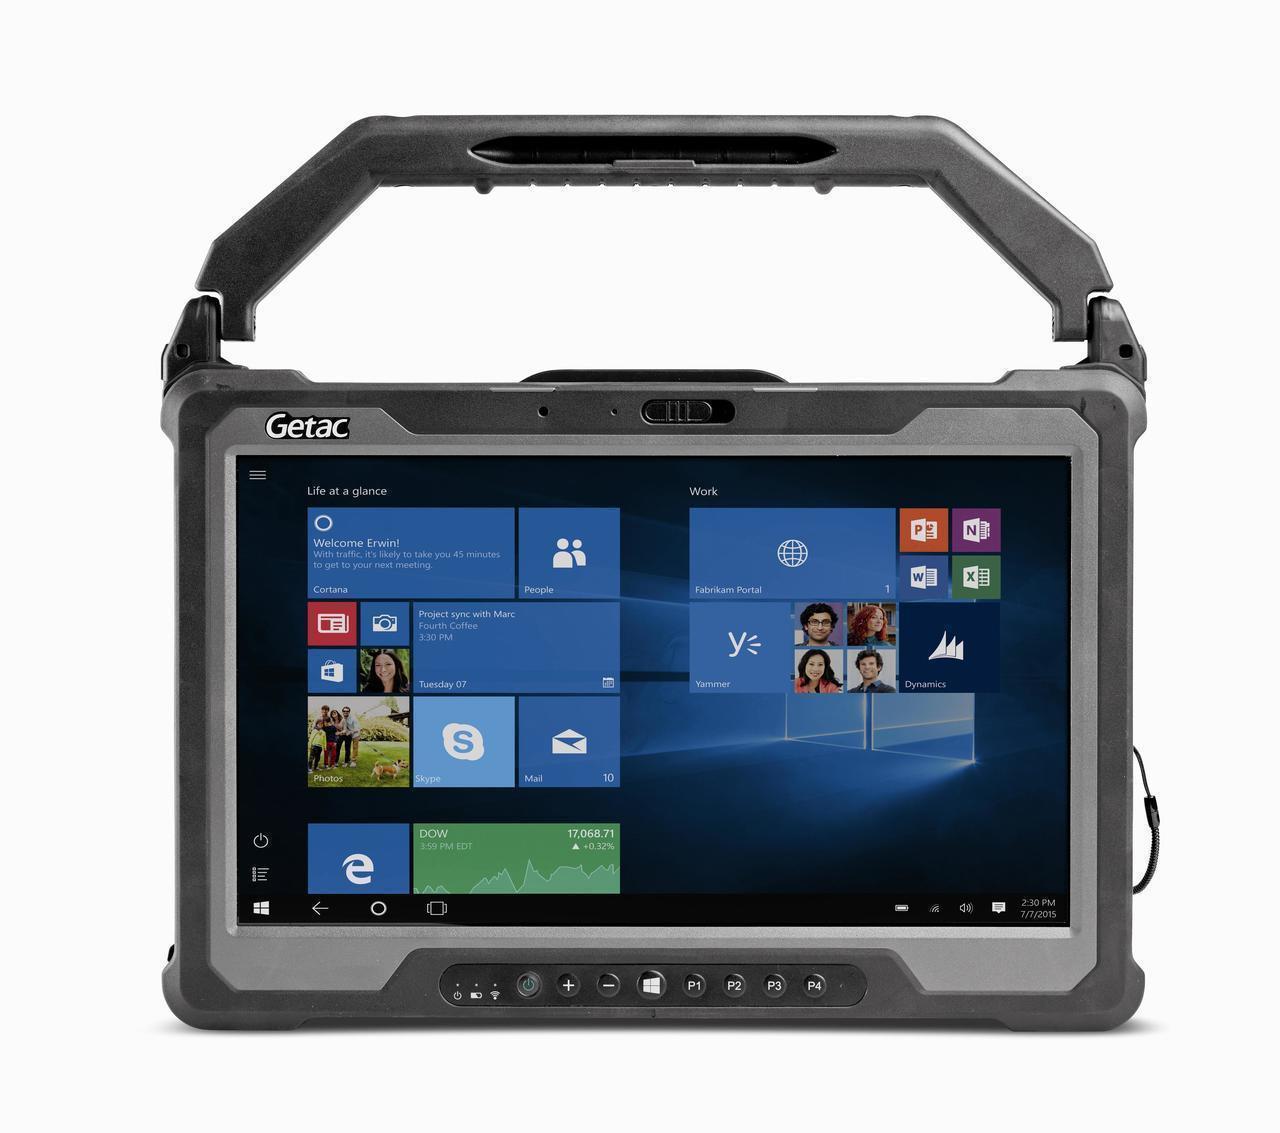 Getac A140 LTE,Intel Core i5-6200U Processor 2.3GHz,W/ Webcam,Win10Pro x64 with 16GB RAM ,256GB SSD,Sunlight Readable (HD IPS+Touch) 8M Rear Camera + 1D/2D Imager barcode reader,Wifi+BT+GPS+4G LTE (EM7511) + Pass-through,MicroSD,LANx2,Smart Card read